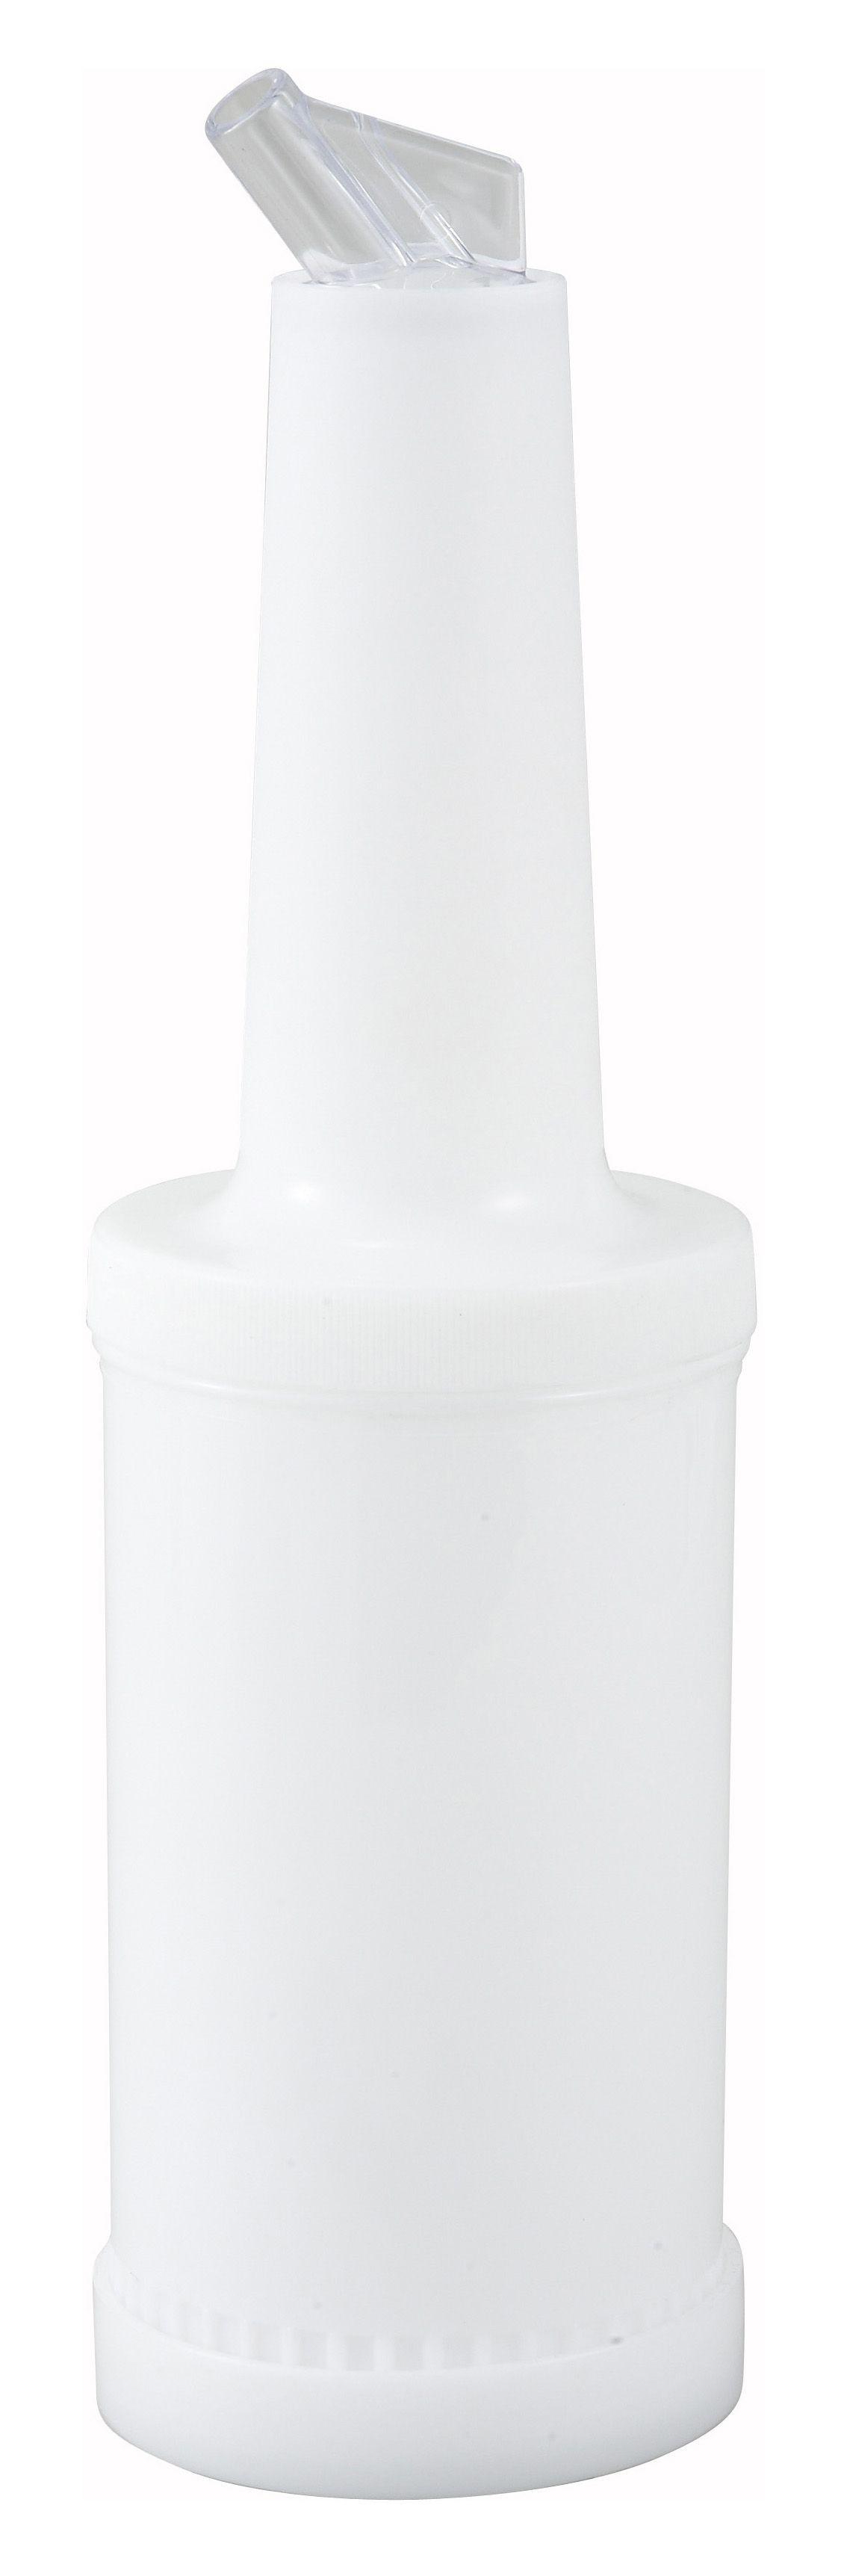 Winco PPB-2W Liquor and Juice Multi-Pour Bottle with White Spout and Lid 2 Qt.